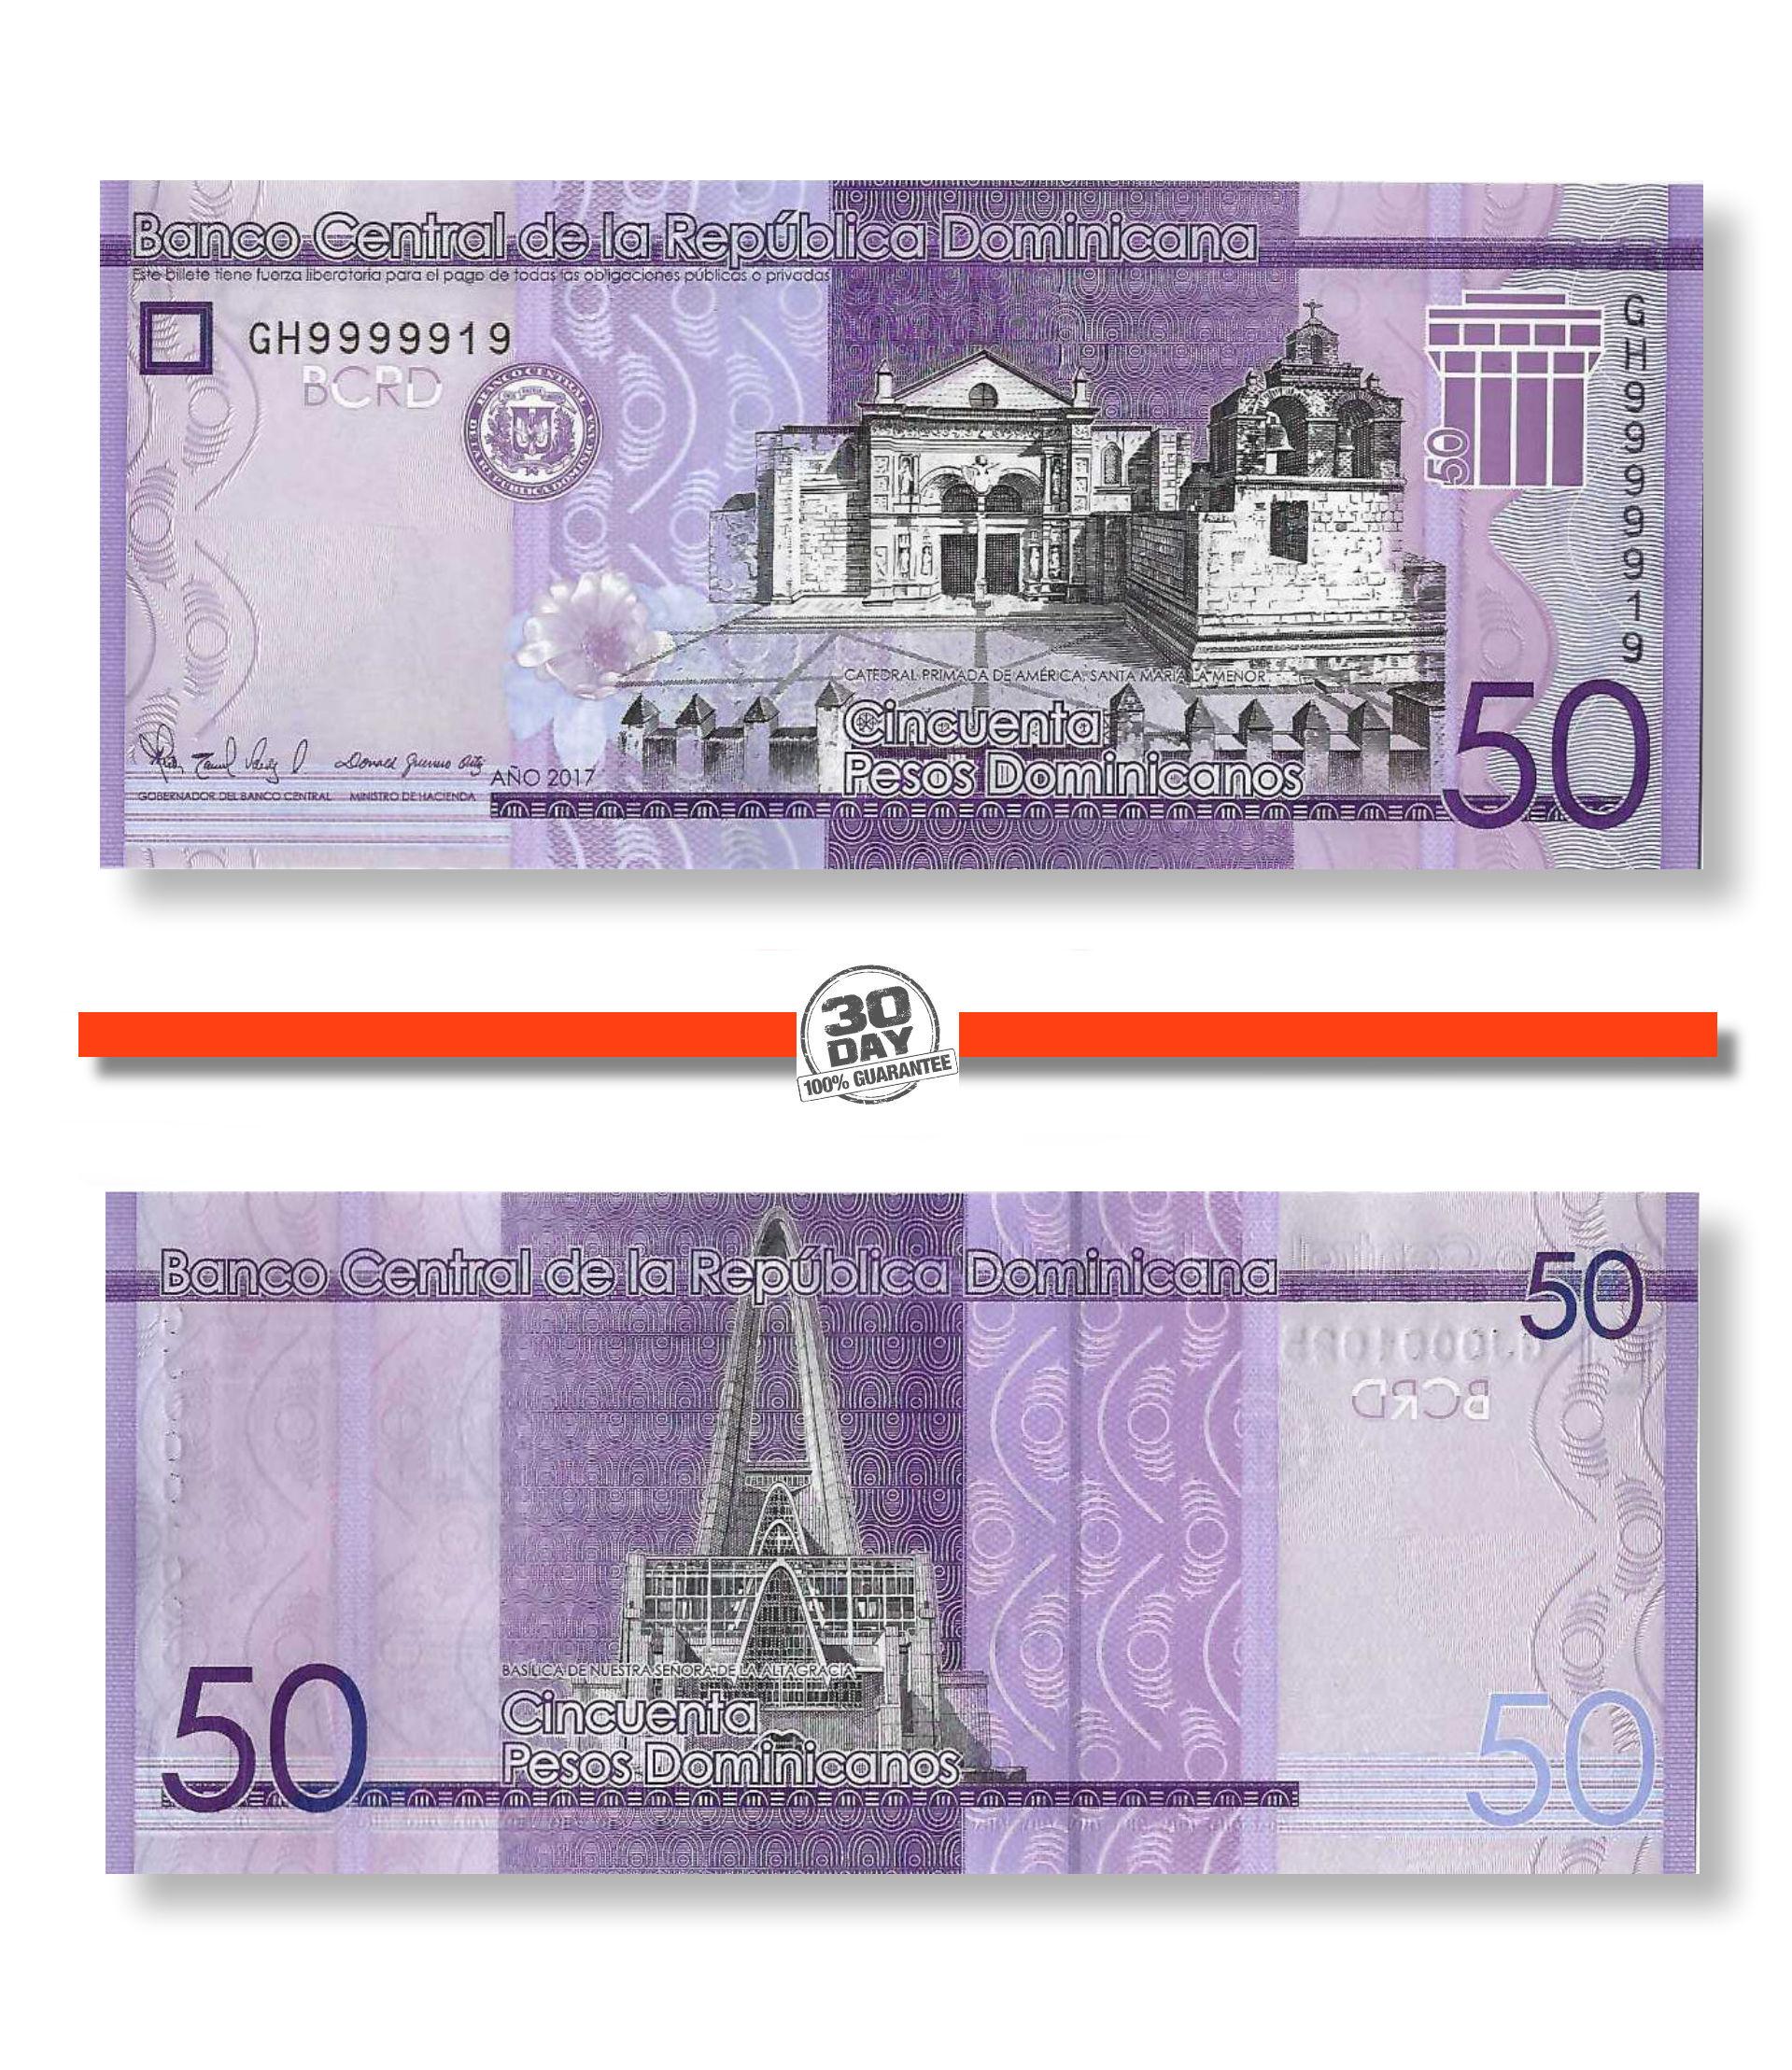 Dominican Republic 50 Pesos Dominicanos P-New UNC /> New design 2019 2017